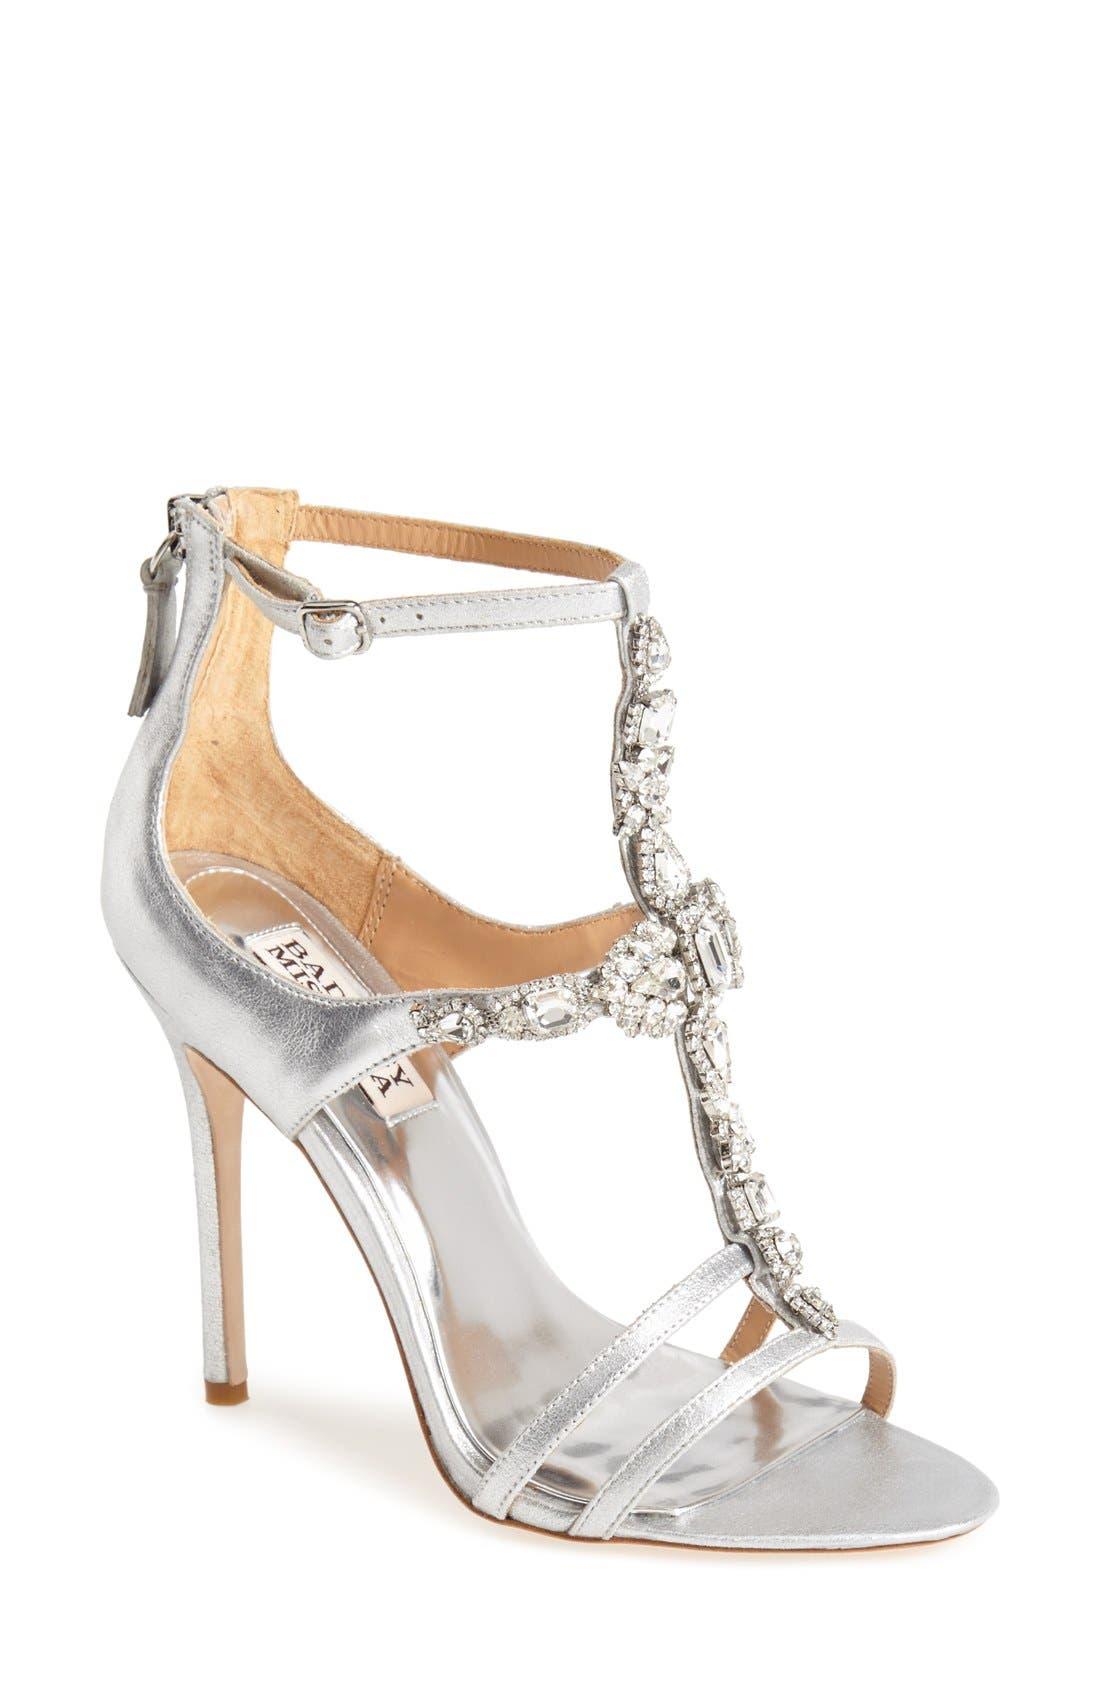 Main Image - Badgley Mischka 'Giovanna II' Satin Ankle Strap Sandal (Women)